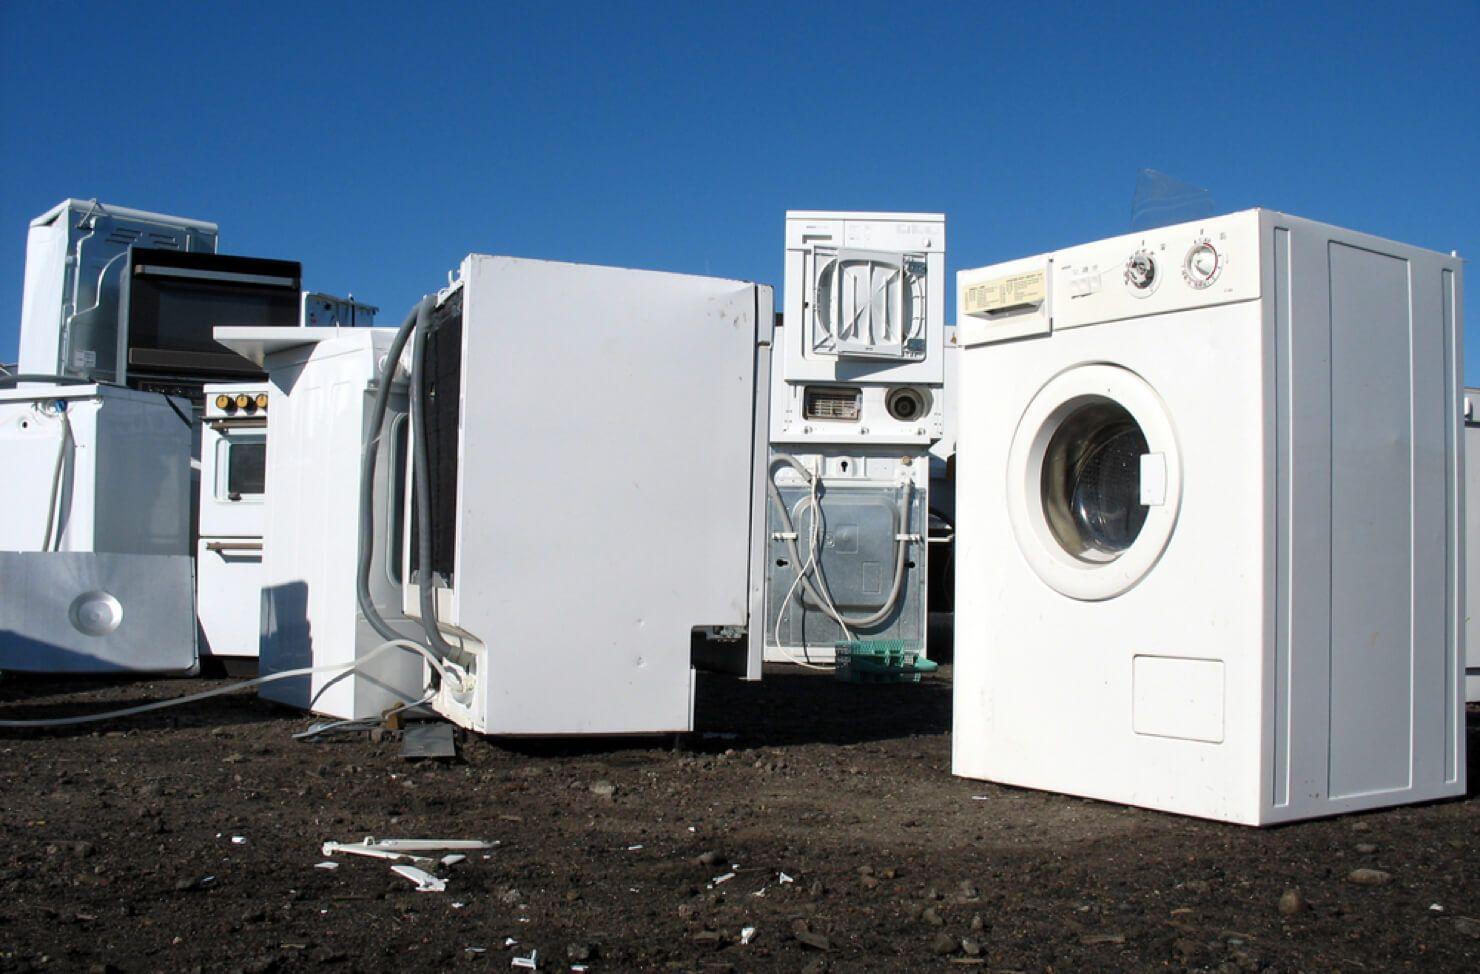 Fridge freezer, washing machine collection for free